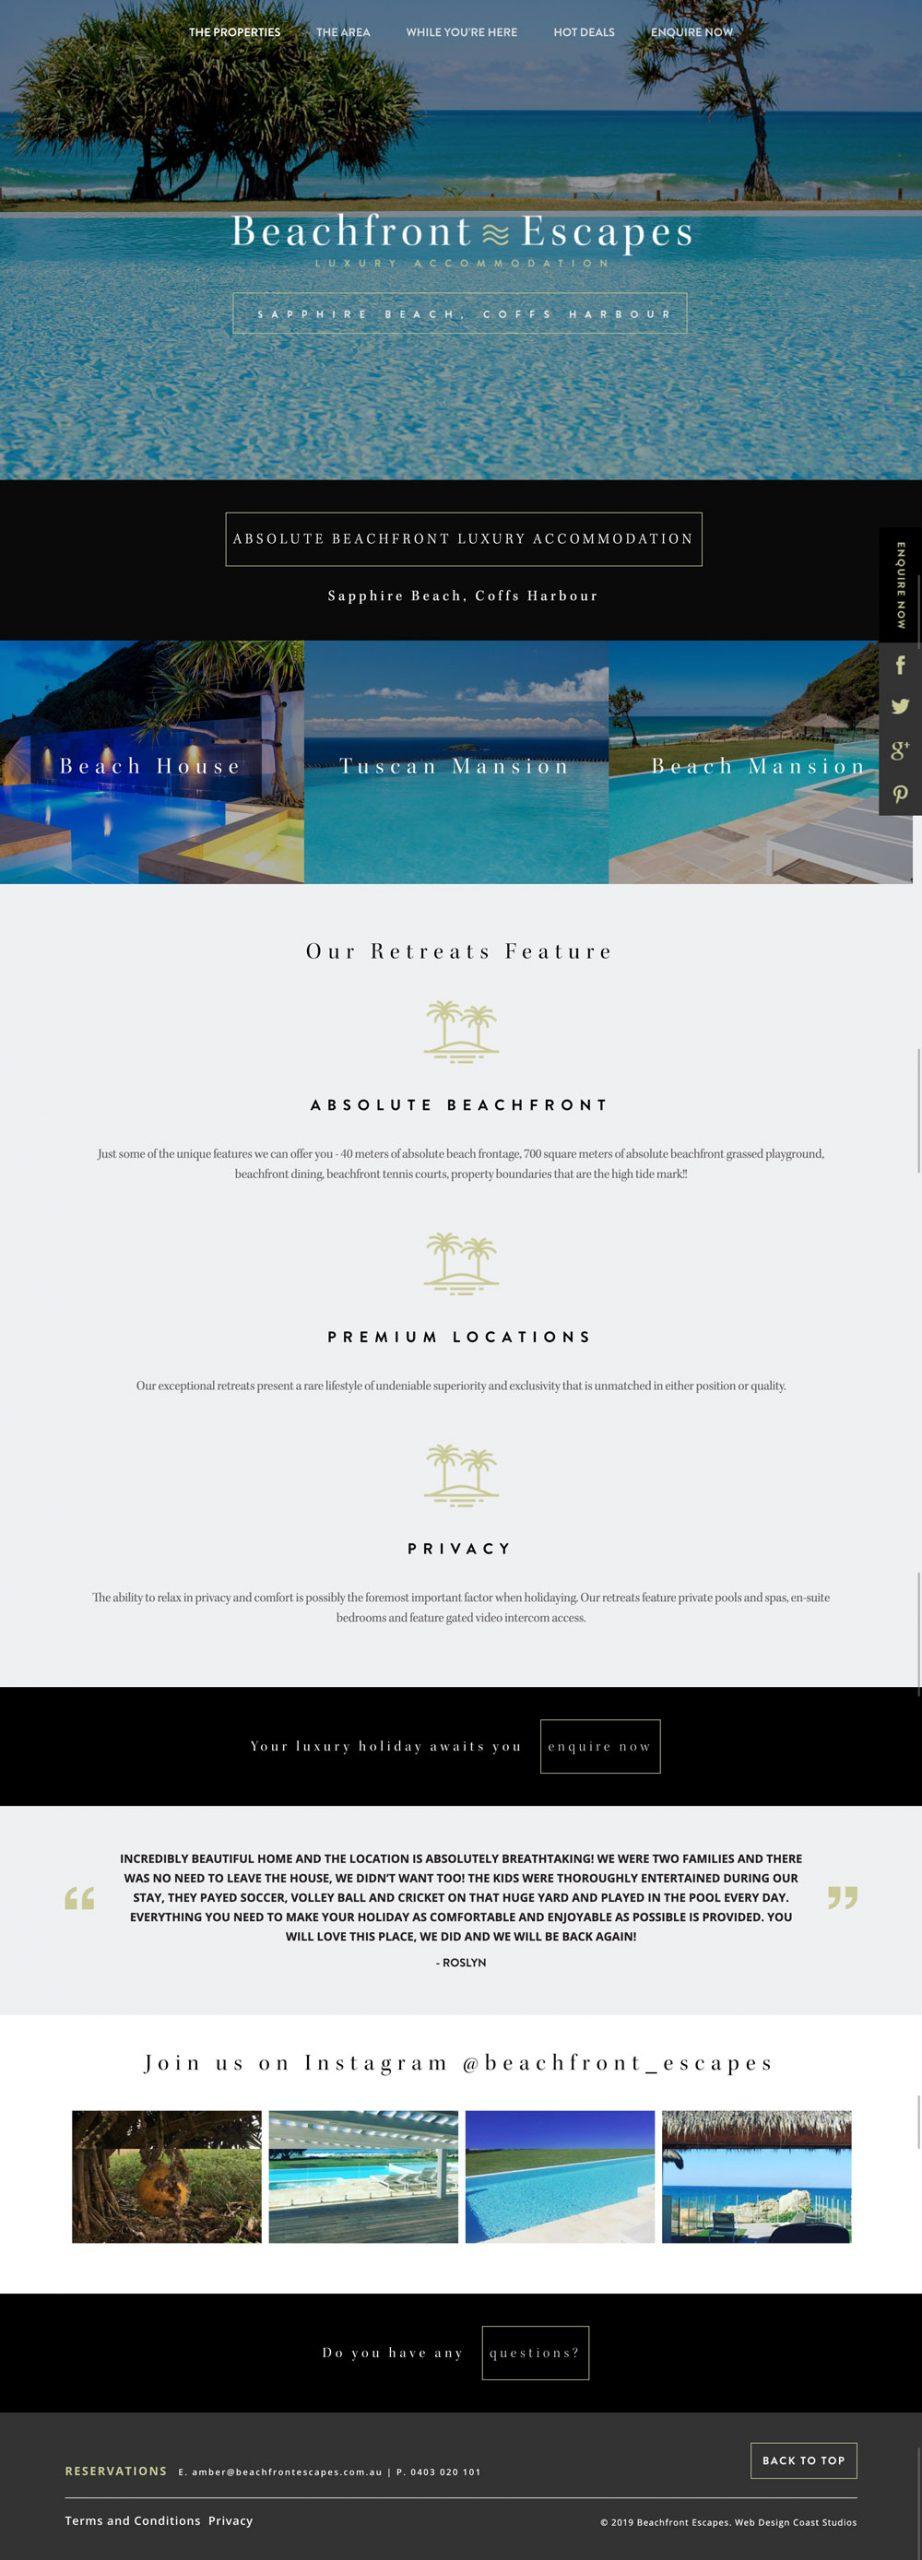 Website Design & Development for Beachfront Escapes